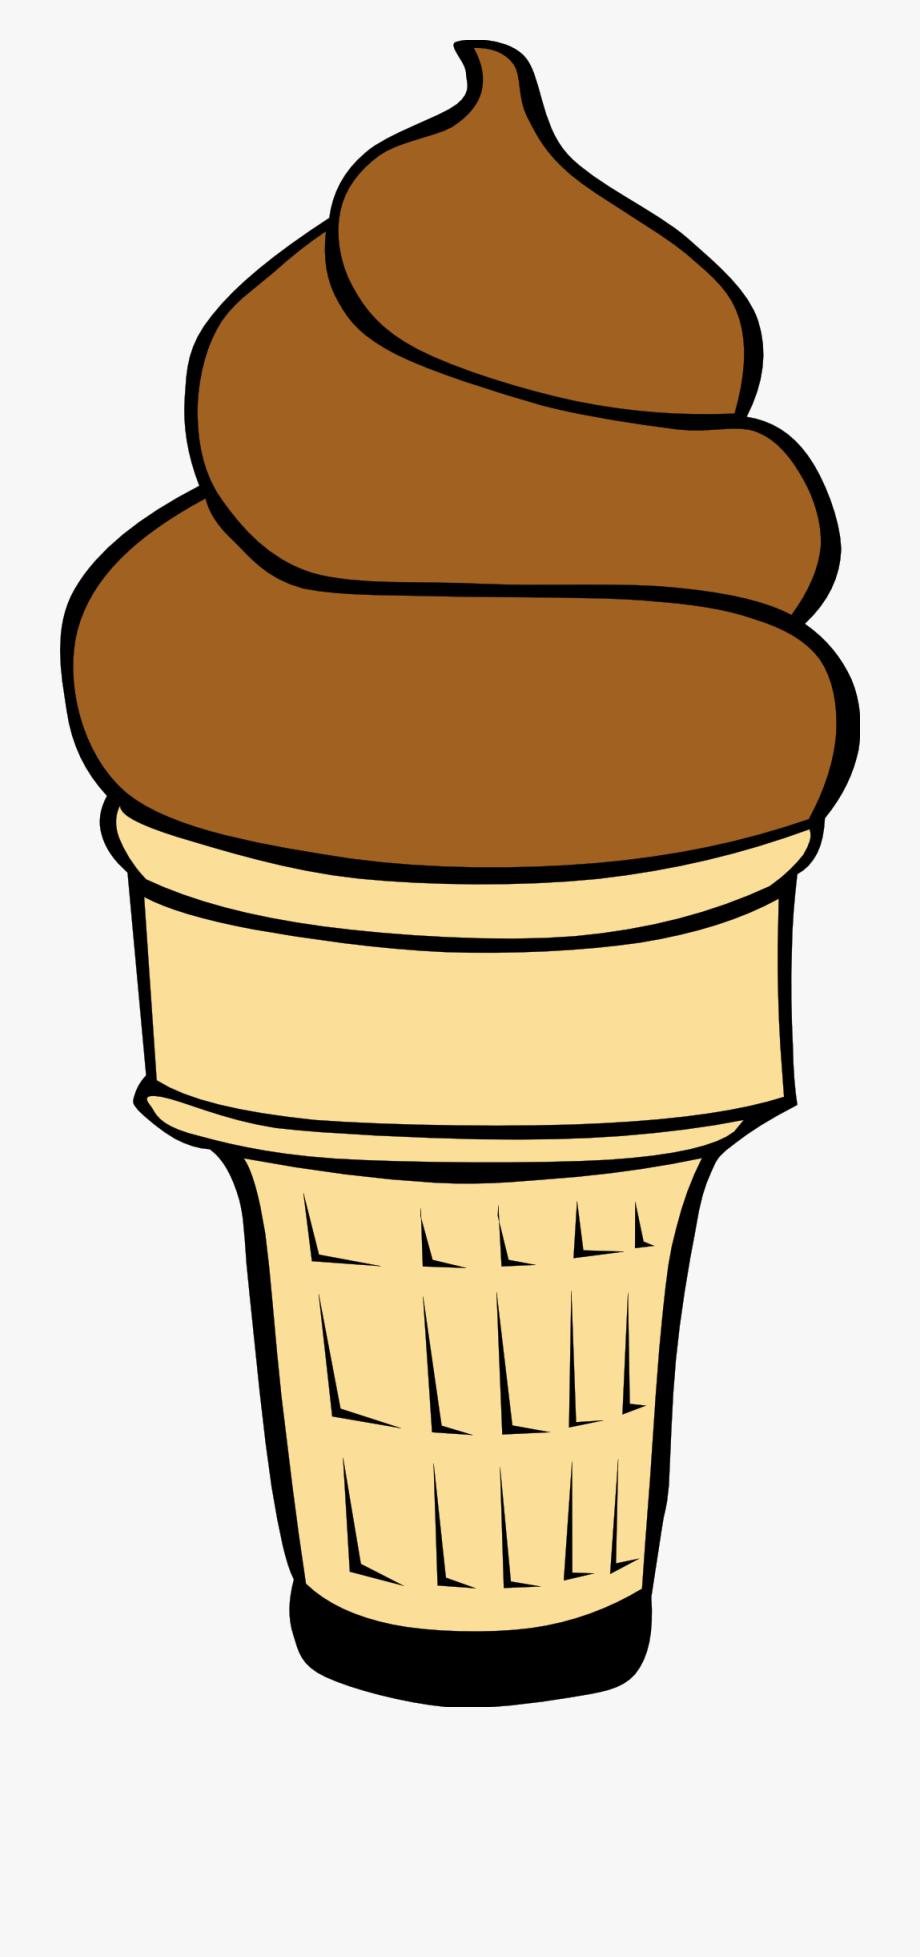 Ice cream cone clip. Icecream clipart chocolate